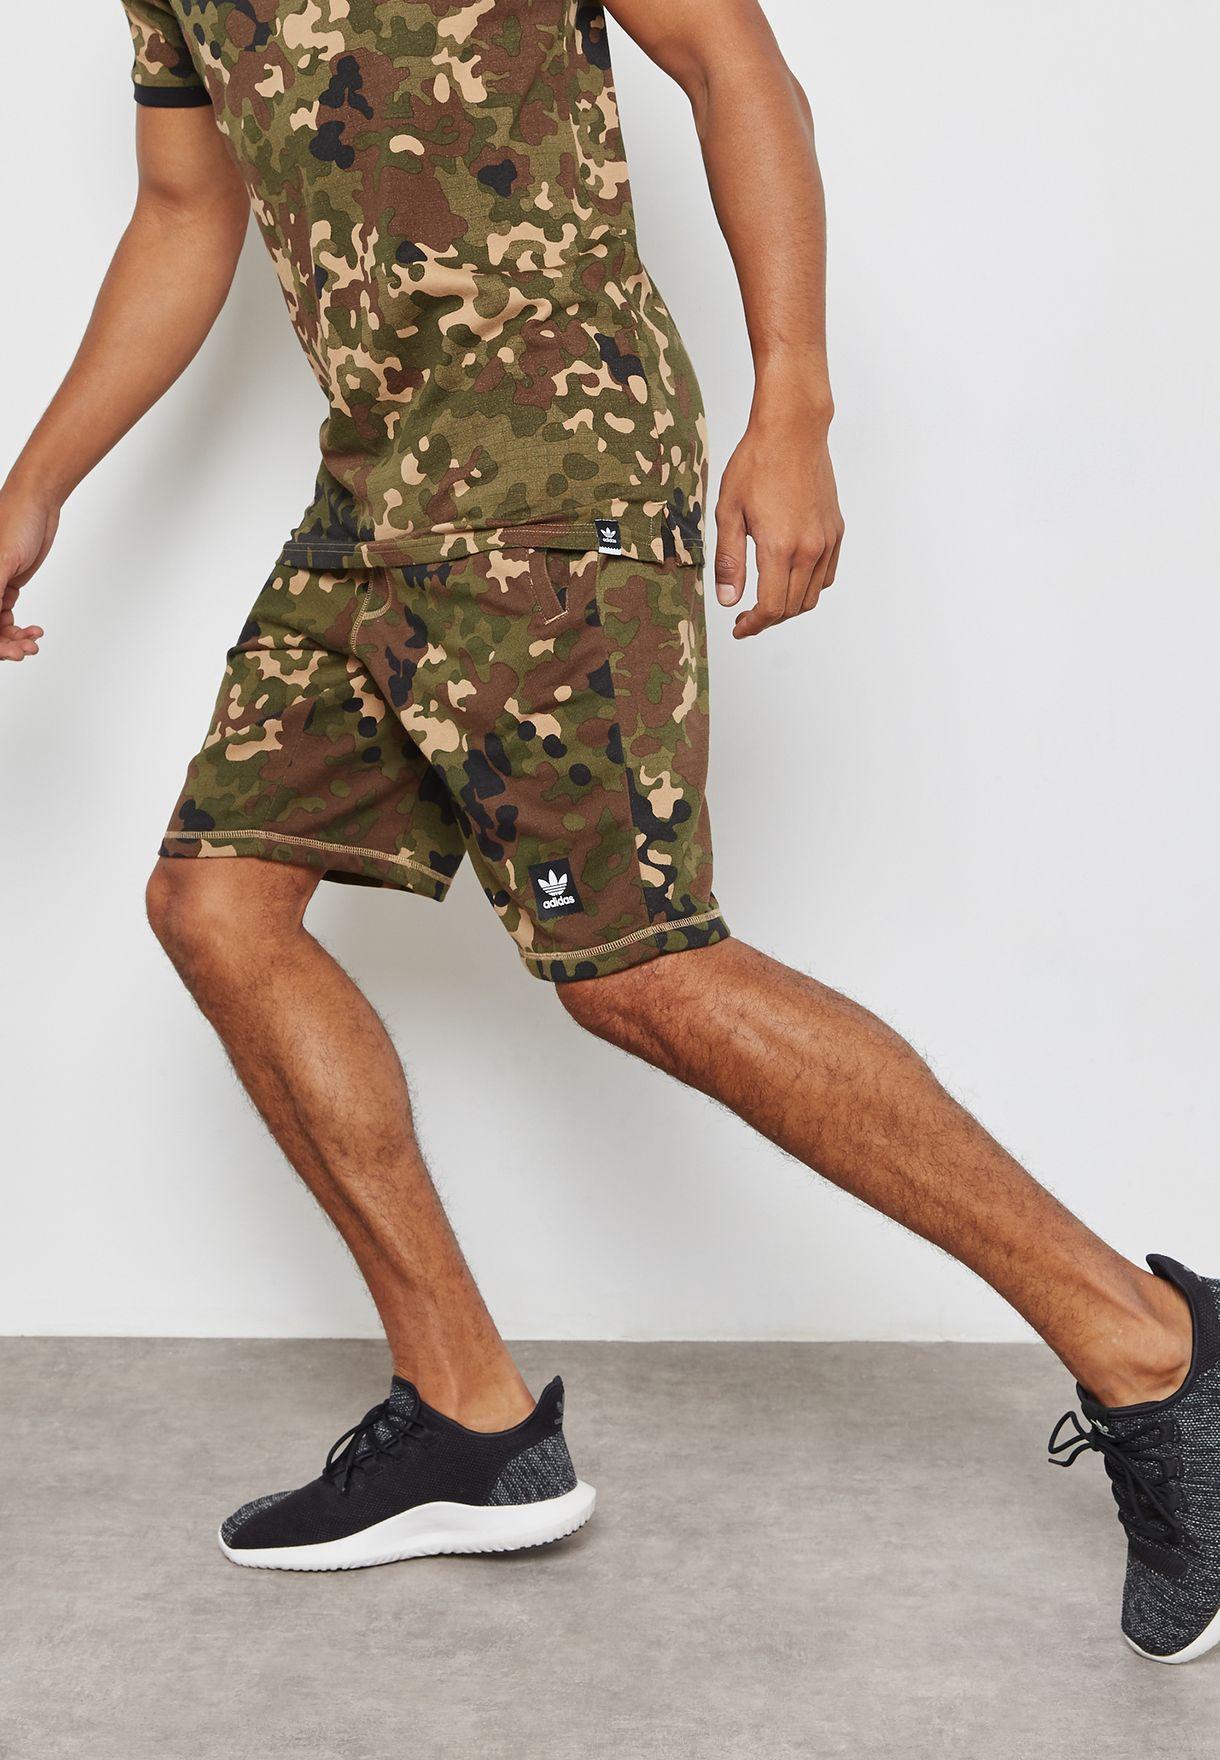 a1cee747a452f Shop adidas Originals prints Blackbird Shorts BR7948 for Men in UAE -  AD478AT76TNZ